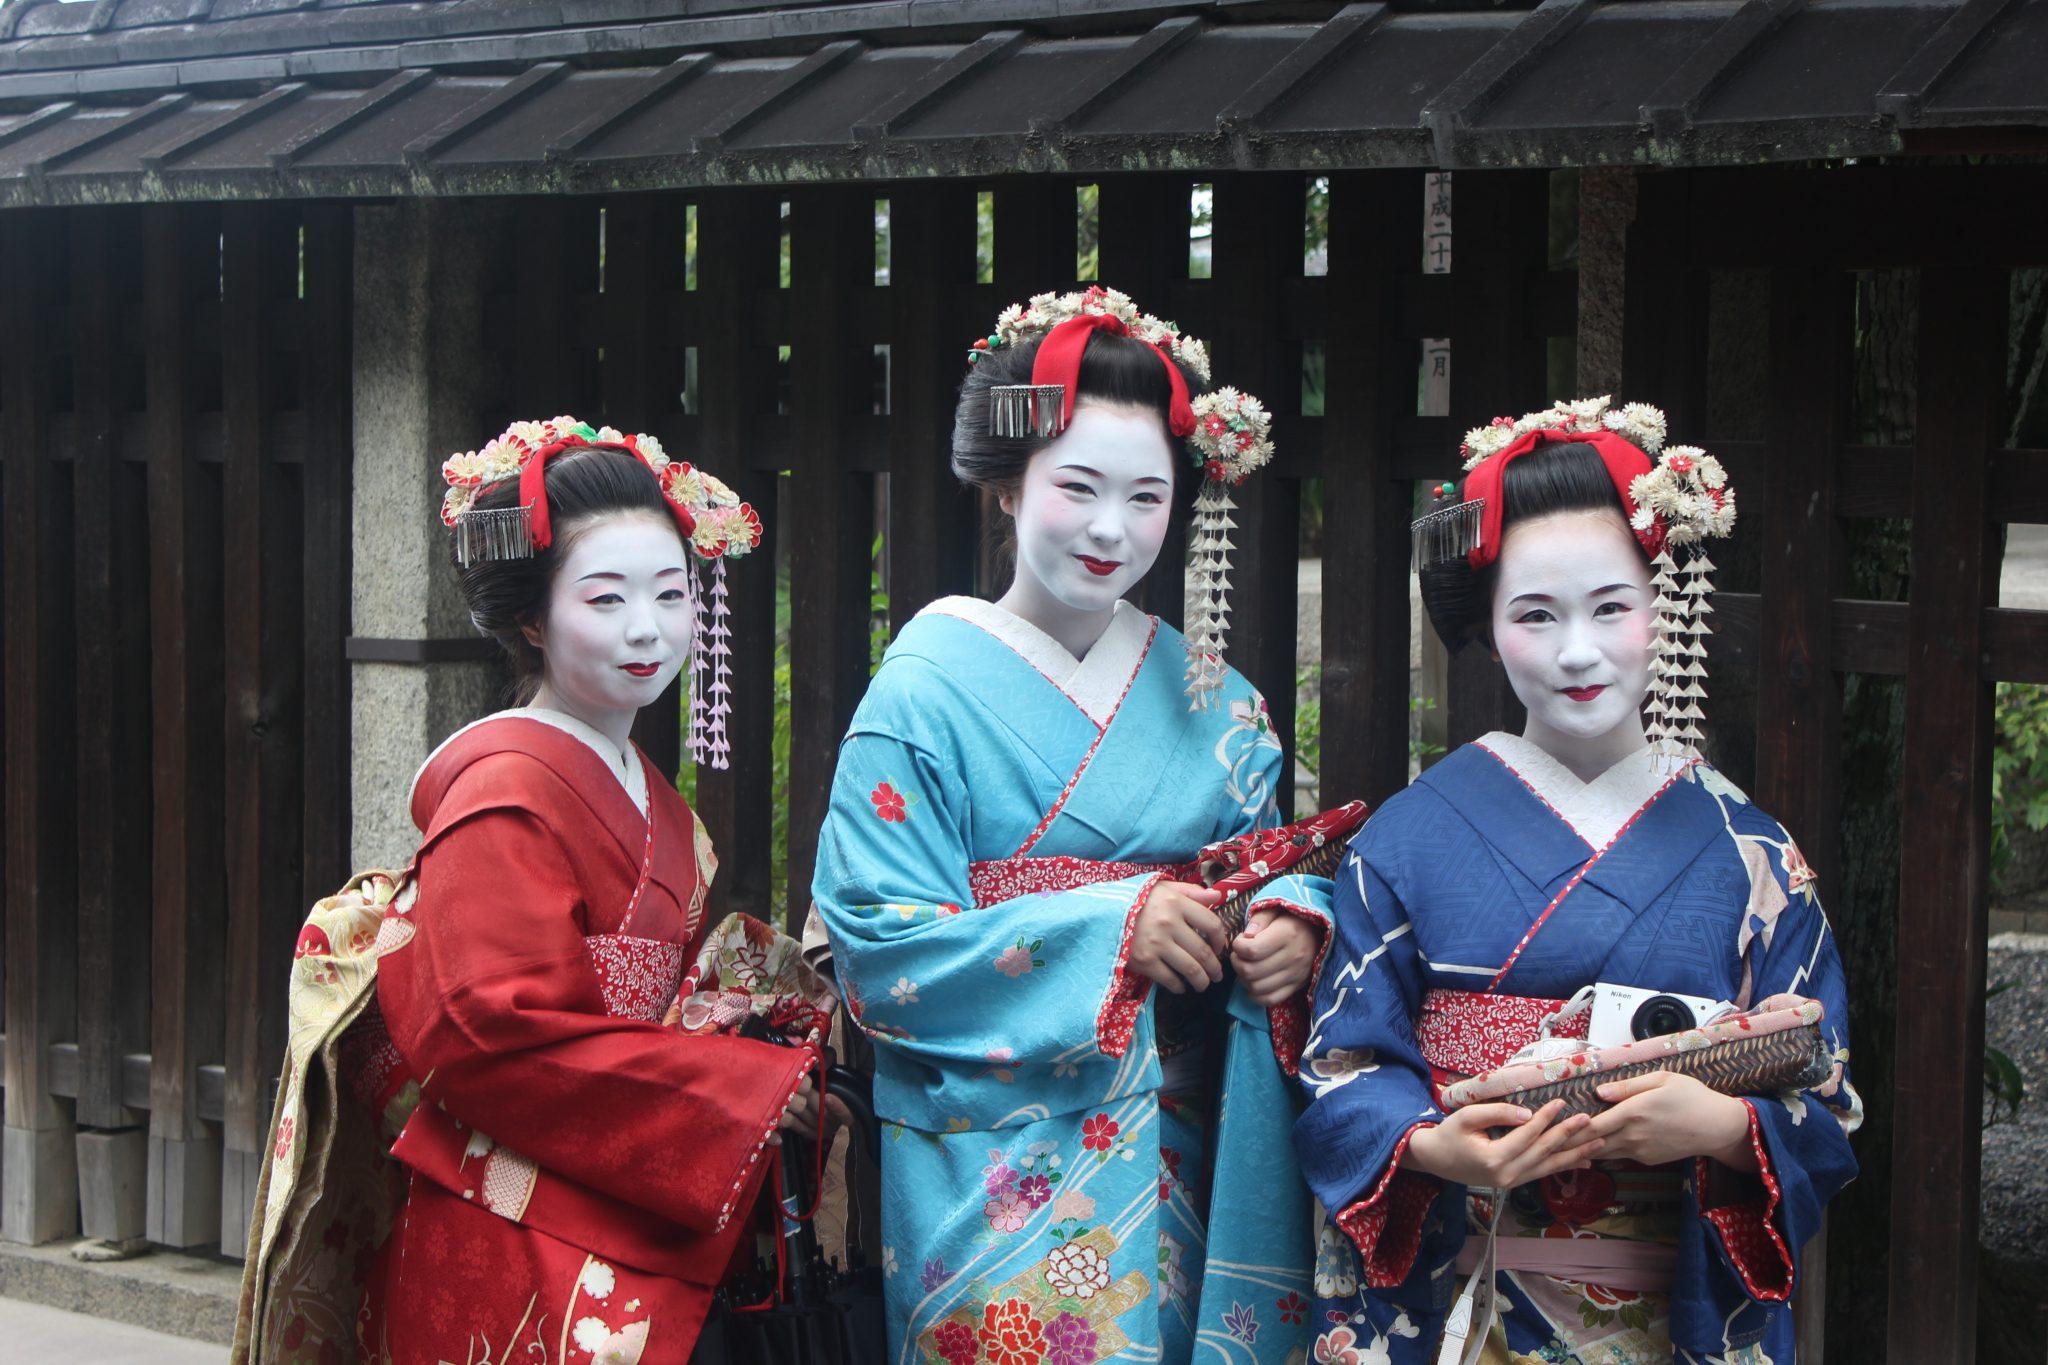 geisha-girls-kimono-culture-woman